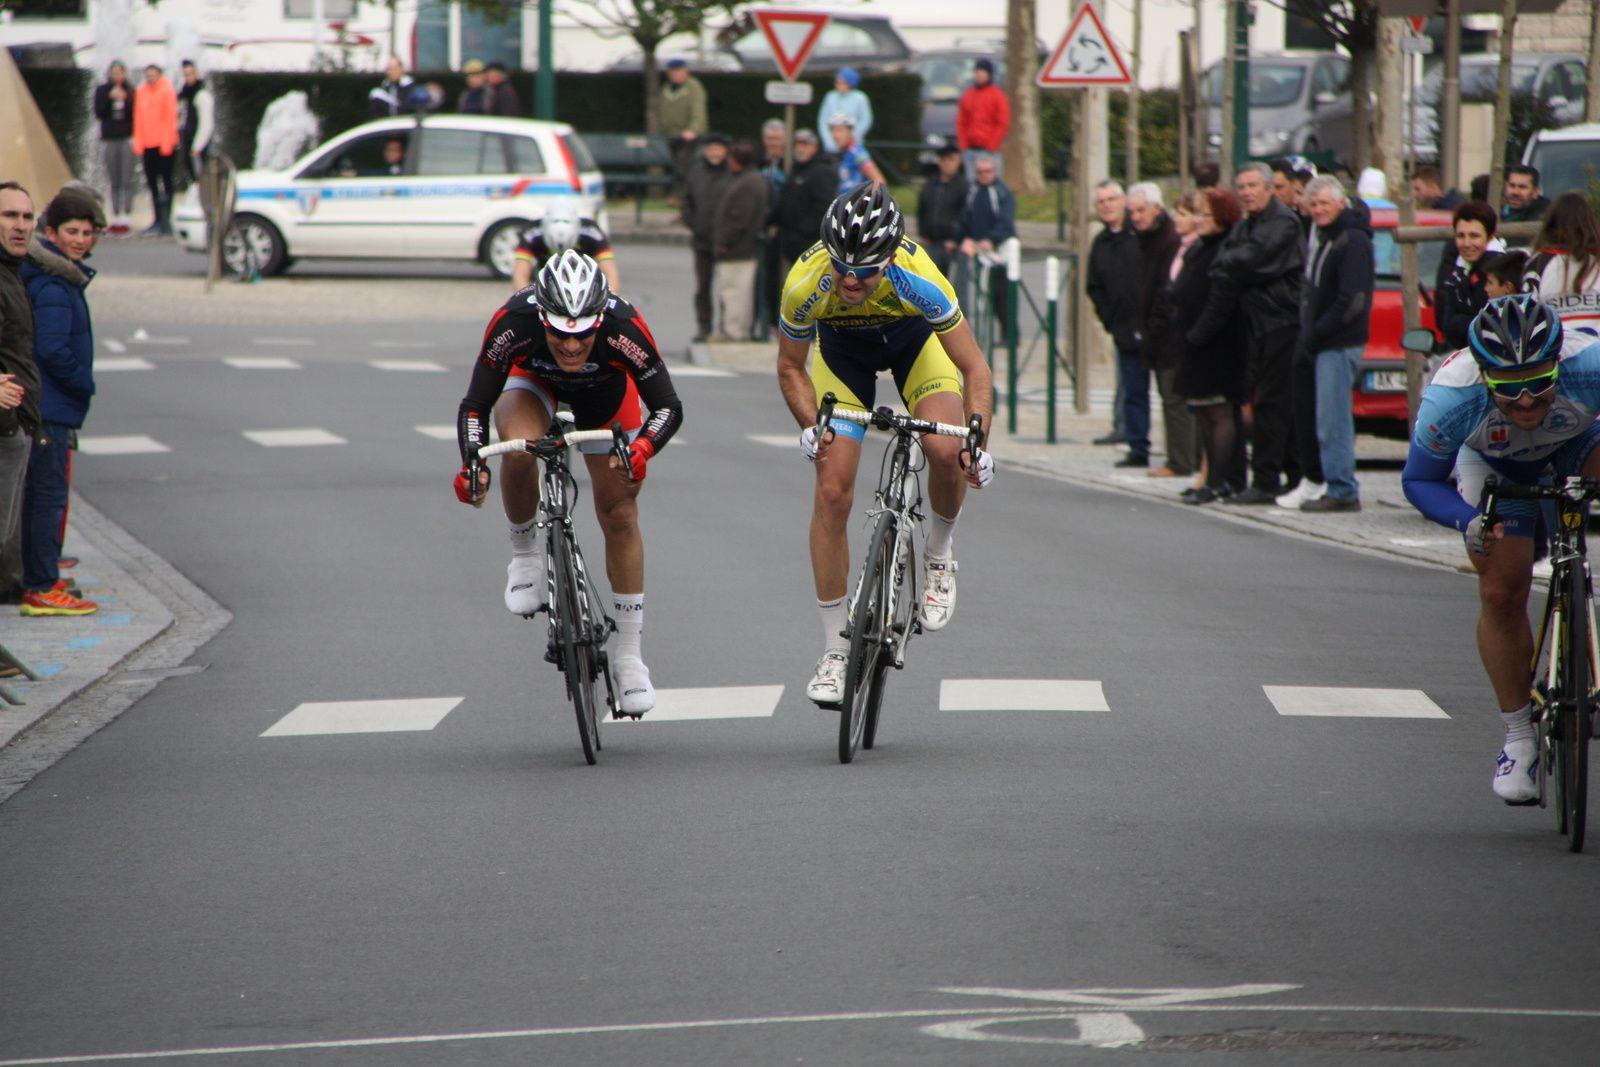 18e  Eric  DARAGNES(SA  Mussidan), 19e  Guillaume  EYNARD(EC  Trélissac-Couloumeix),20e  Jean-Luc  BESARION(UC  Ayguemorte)